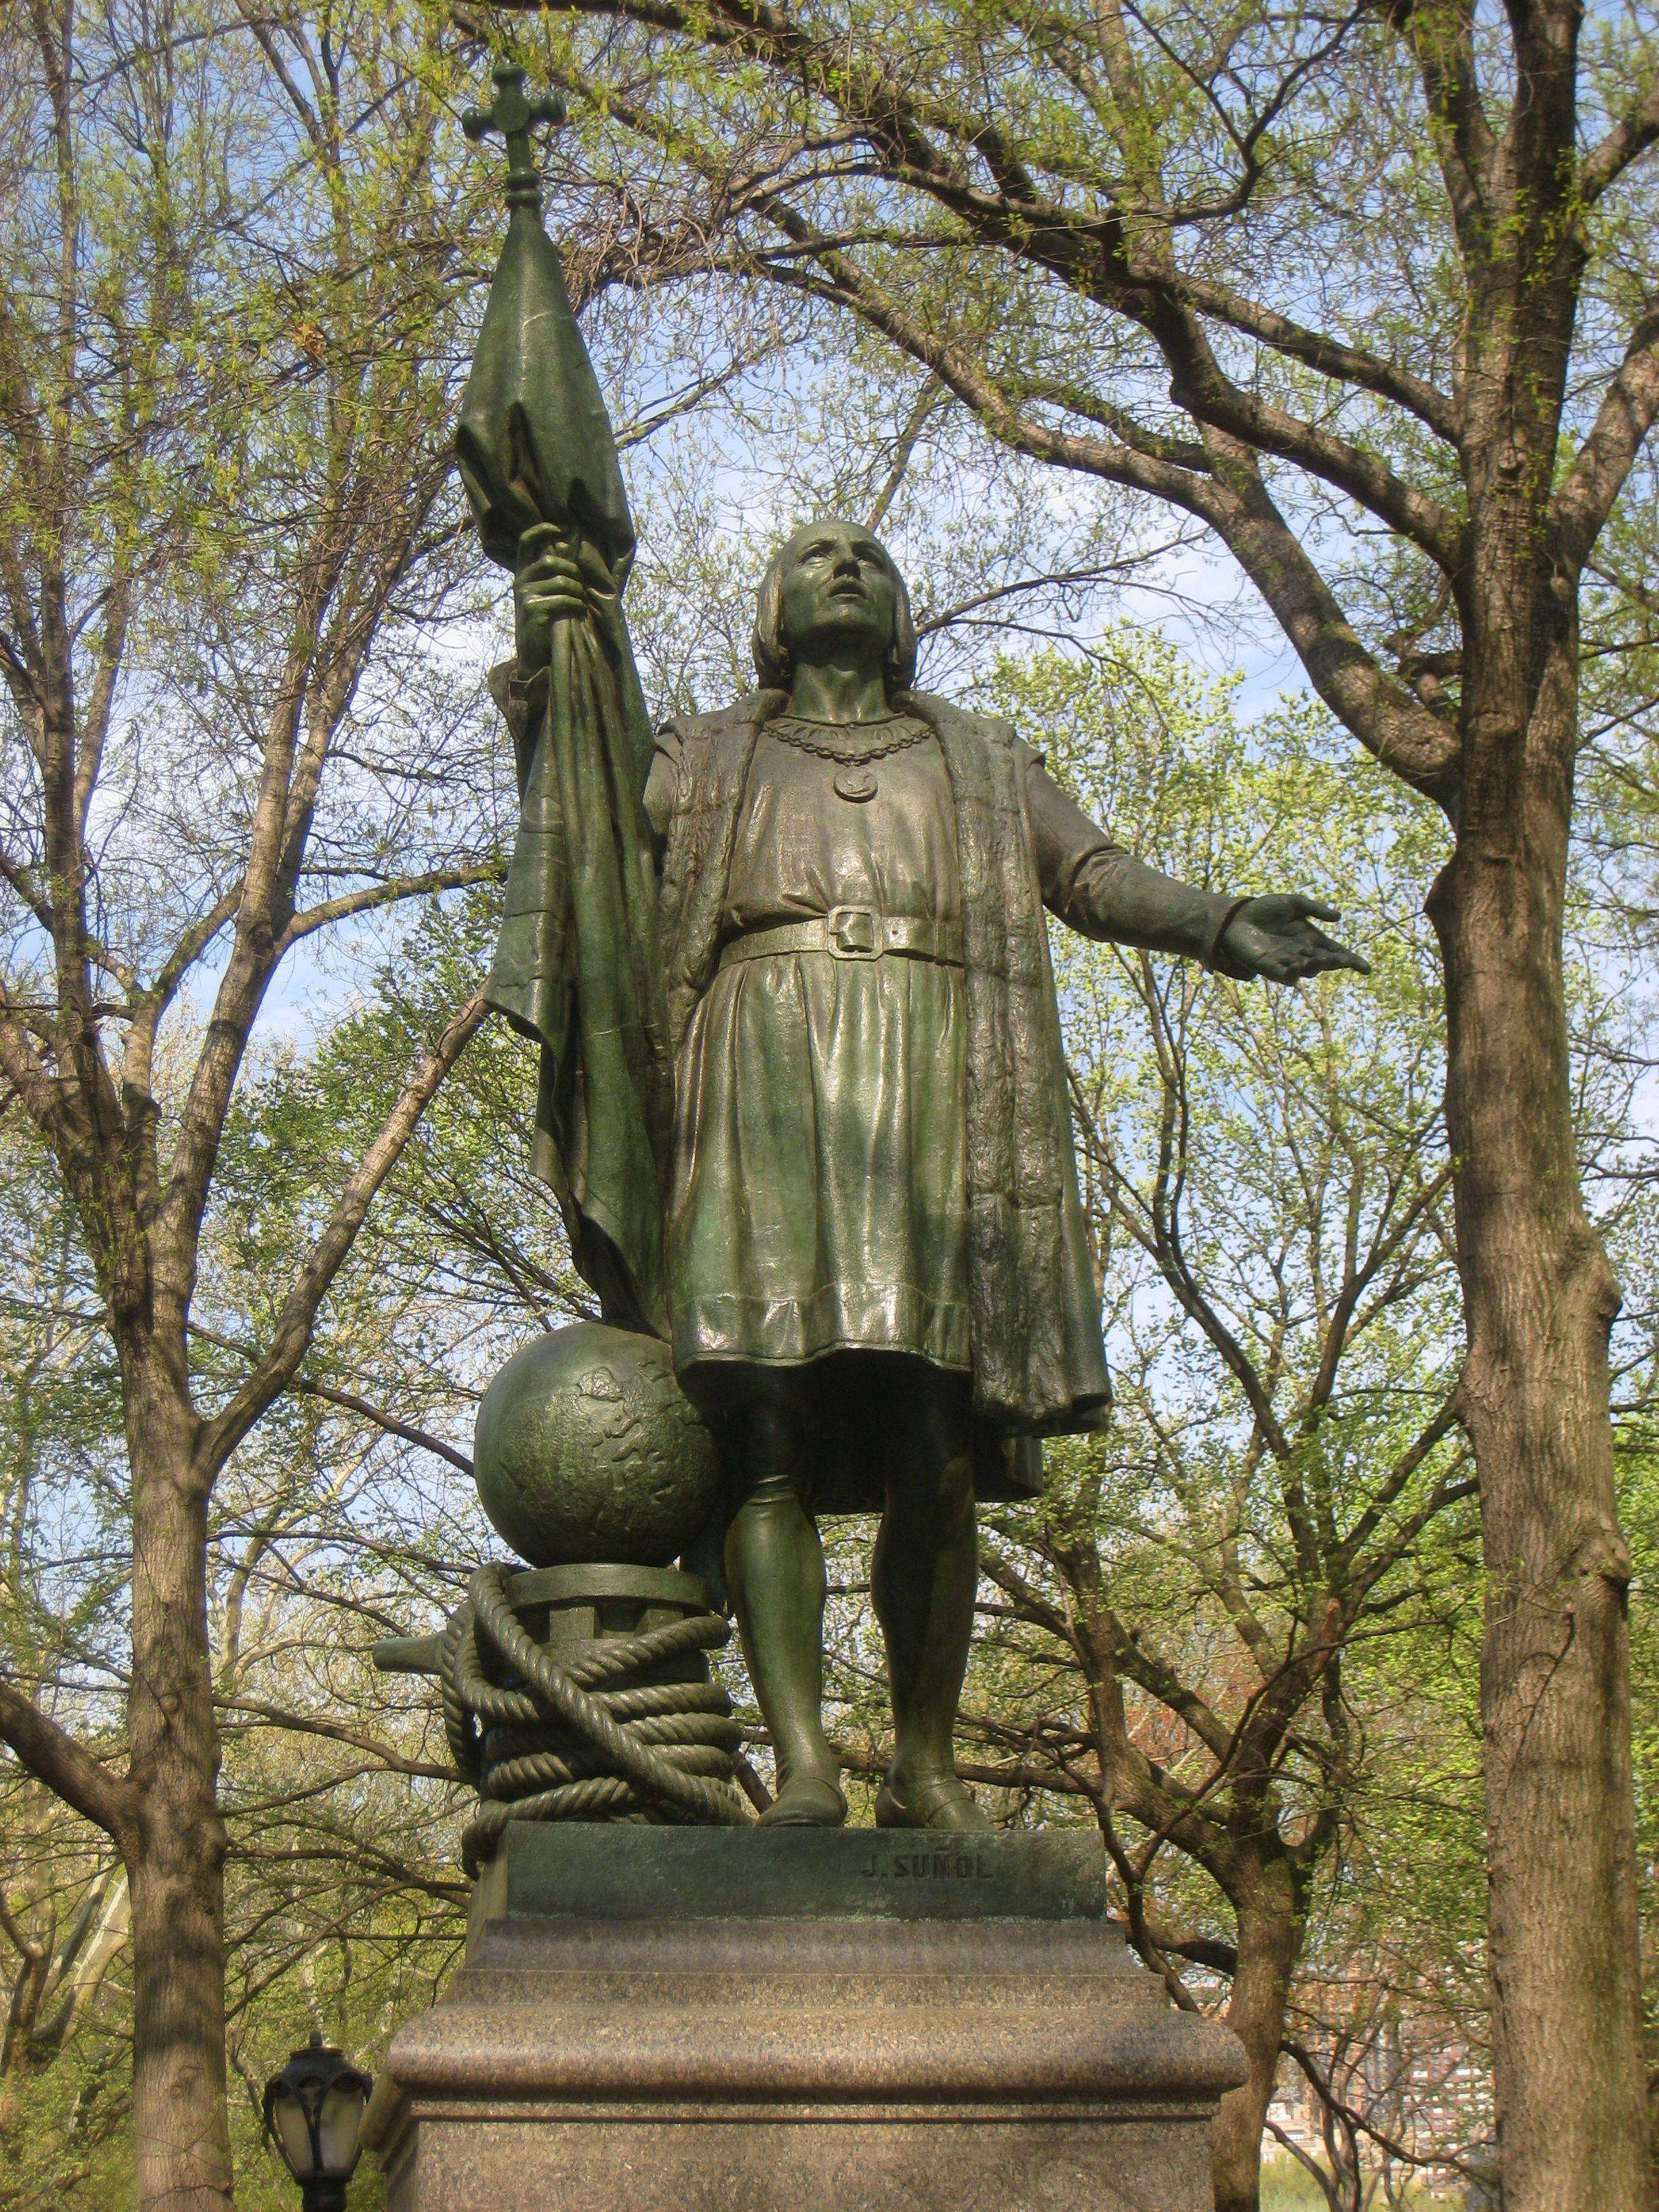 Columbus Monument In New York